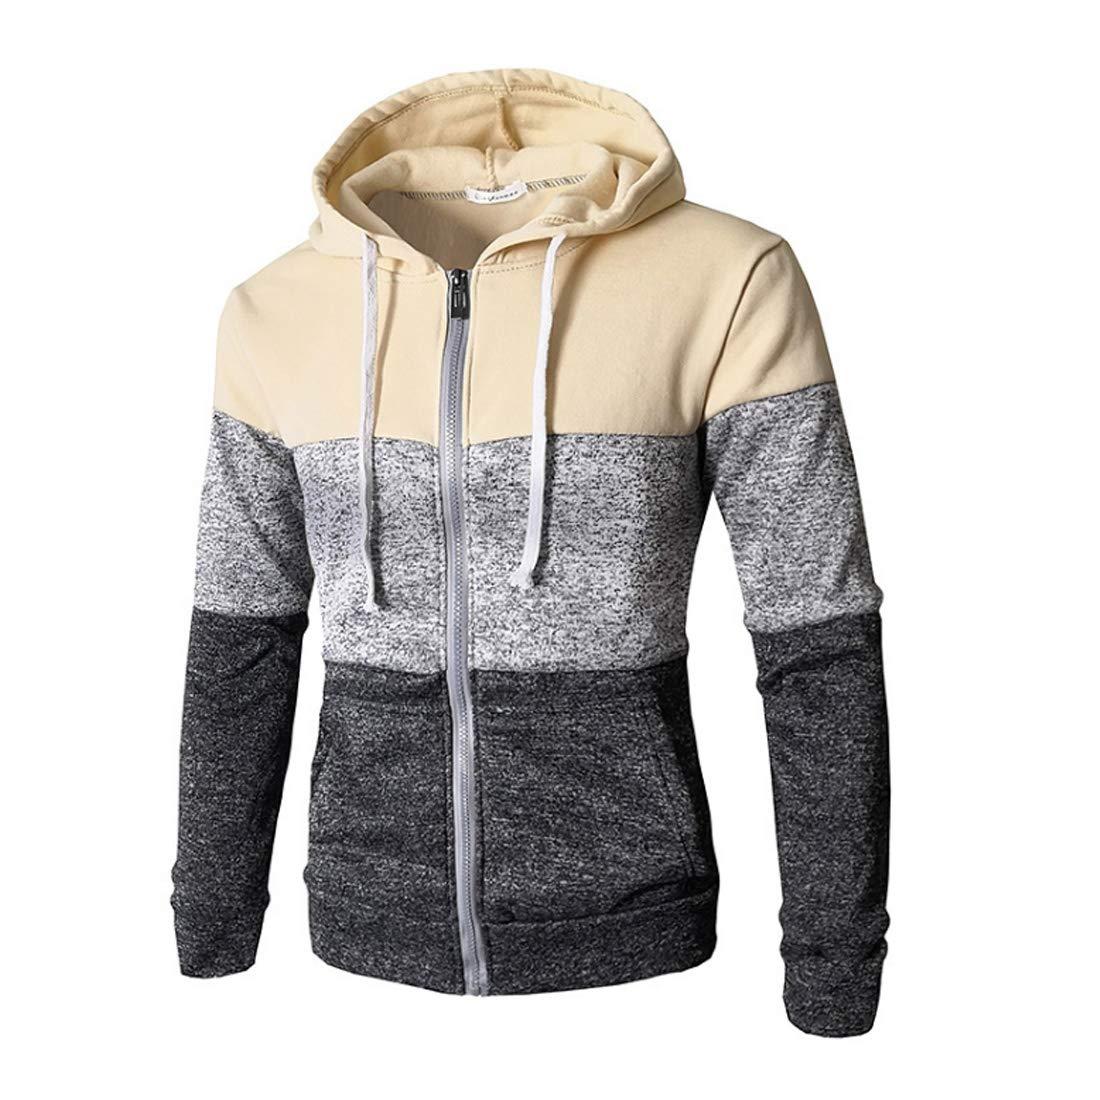 Aiweijia Men Cardigan Sweater Hoodie Patchwork Hip Hop Coat Pullover Sportswear